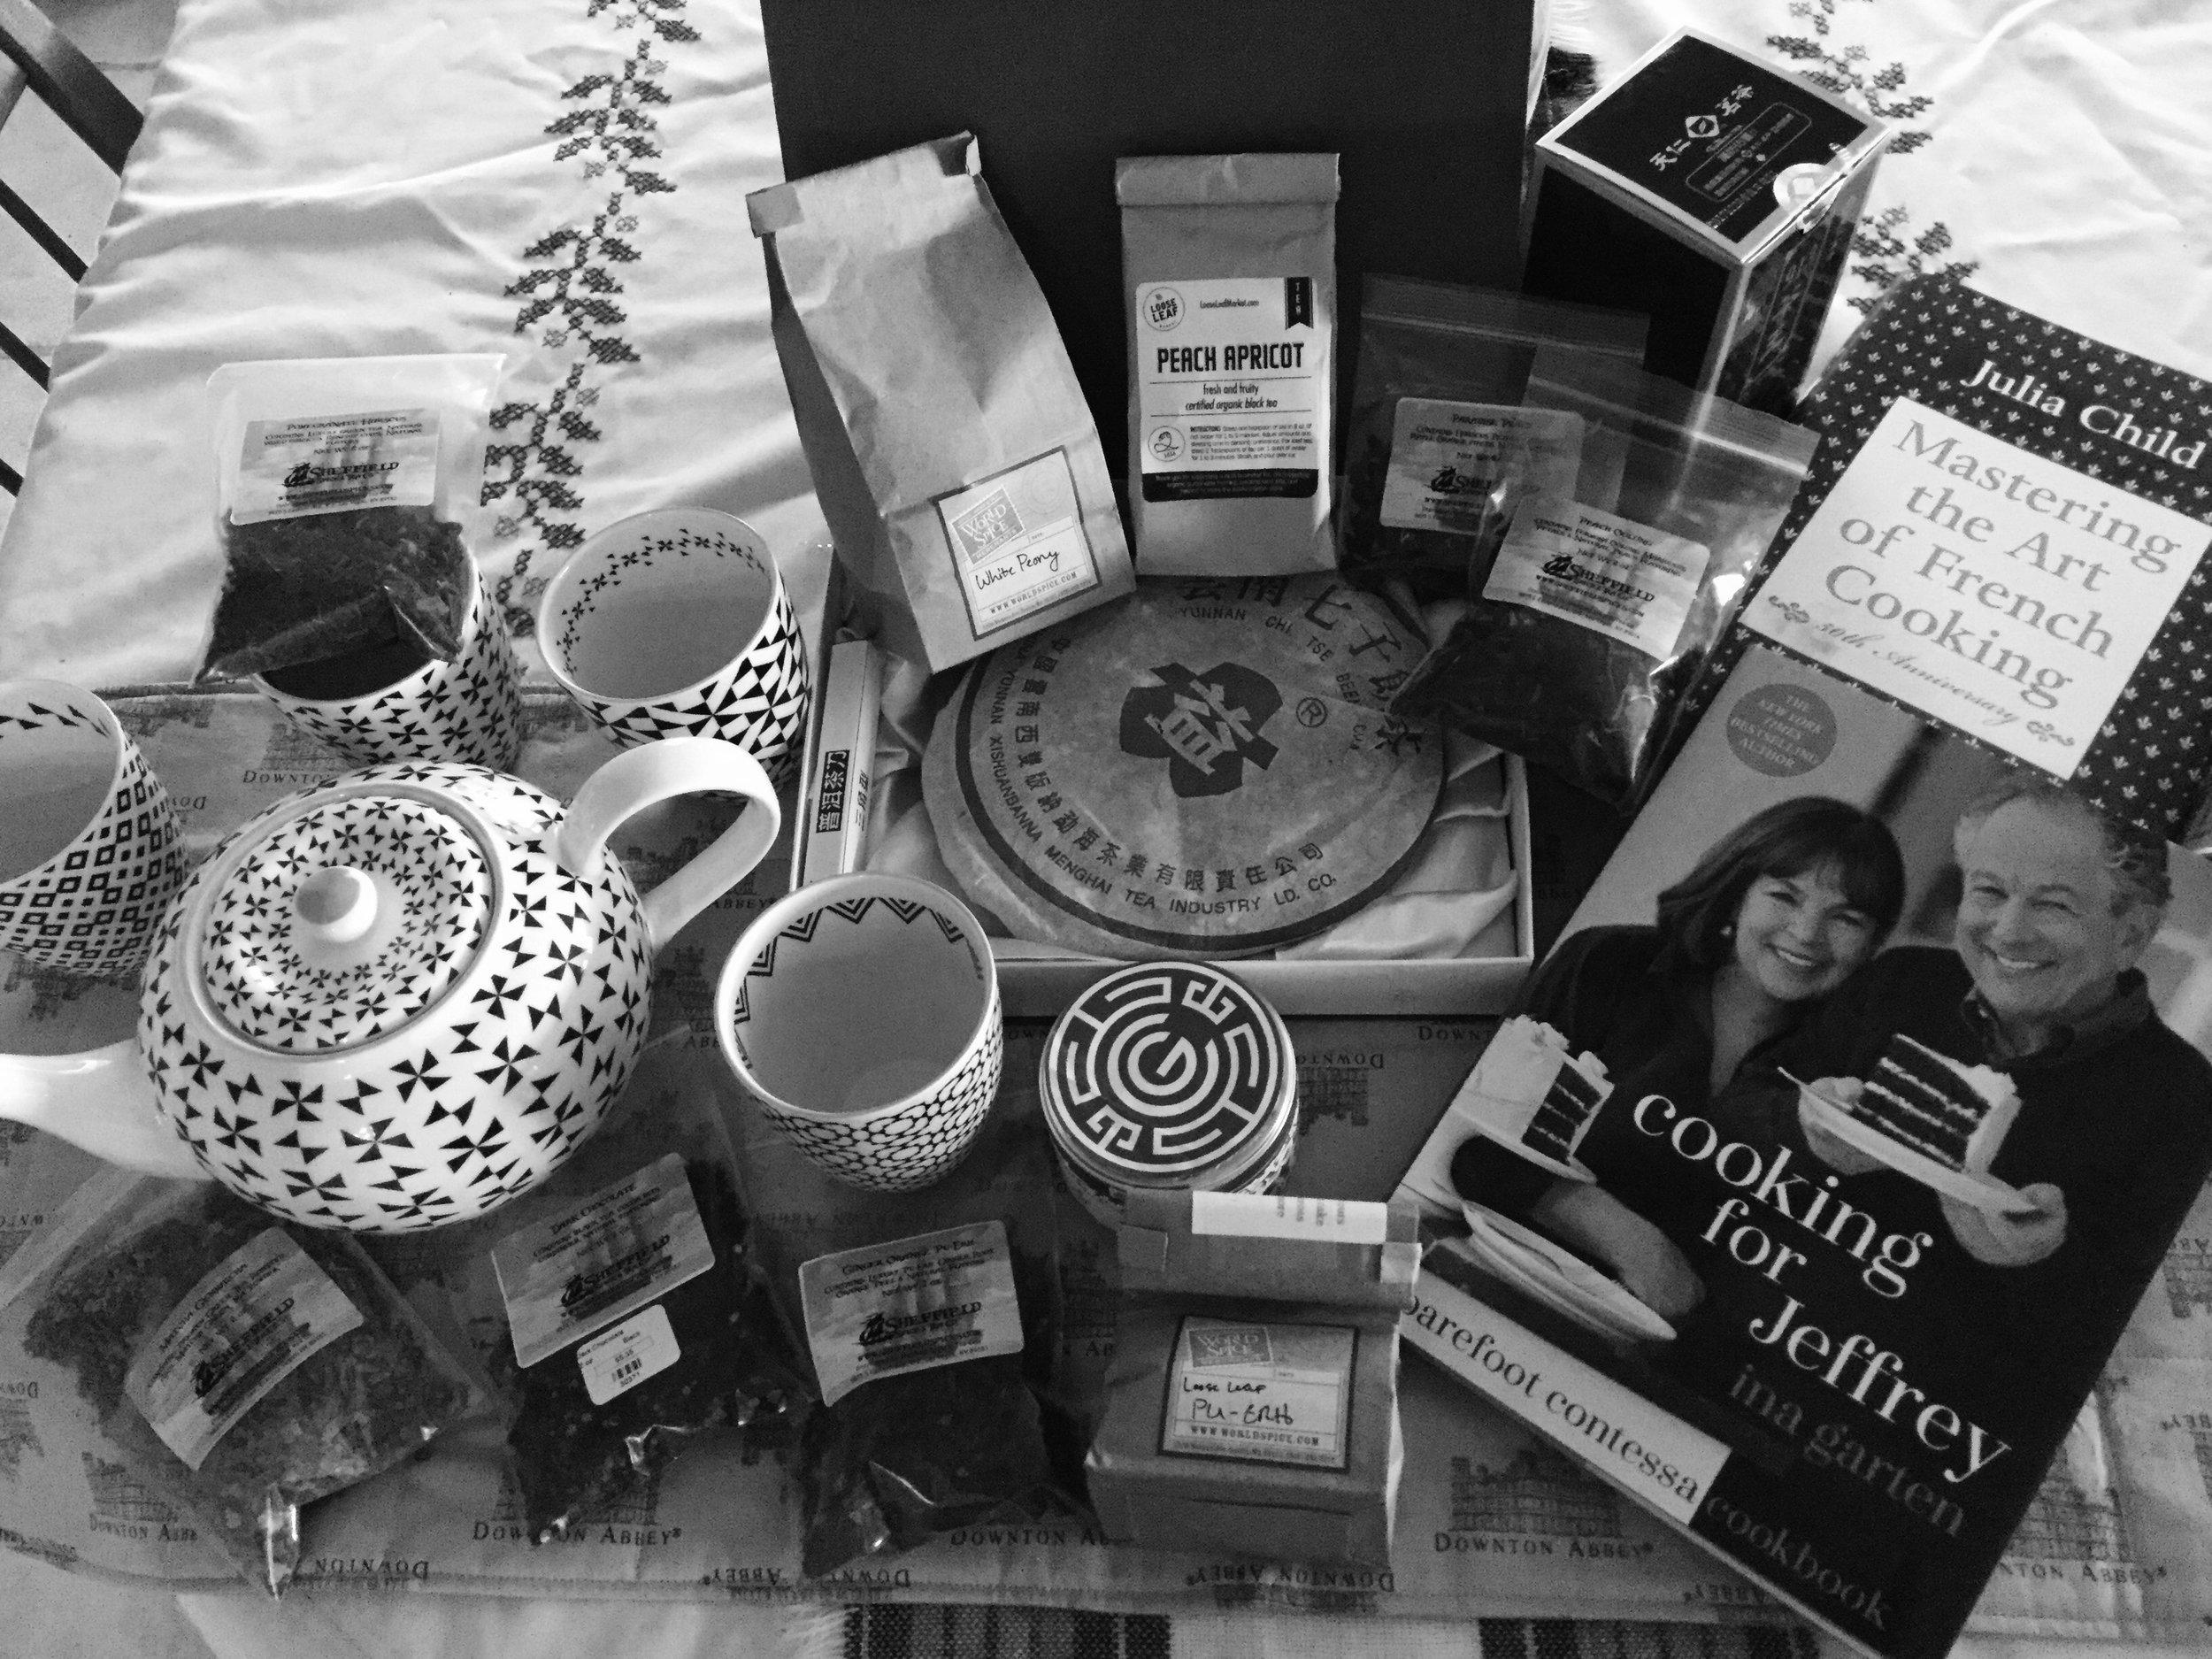 Tea, Tea, and more Tea everywhere. Tea and good books . . . What more could one want?